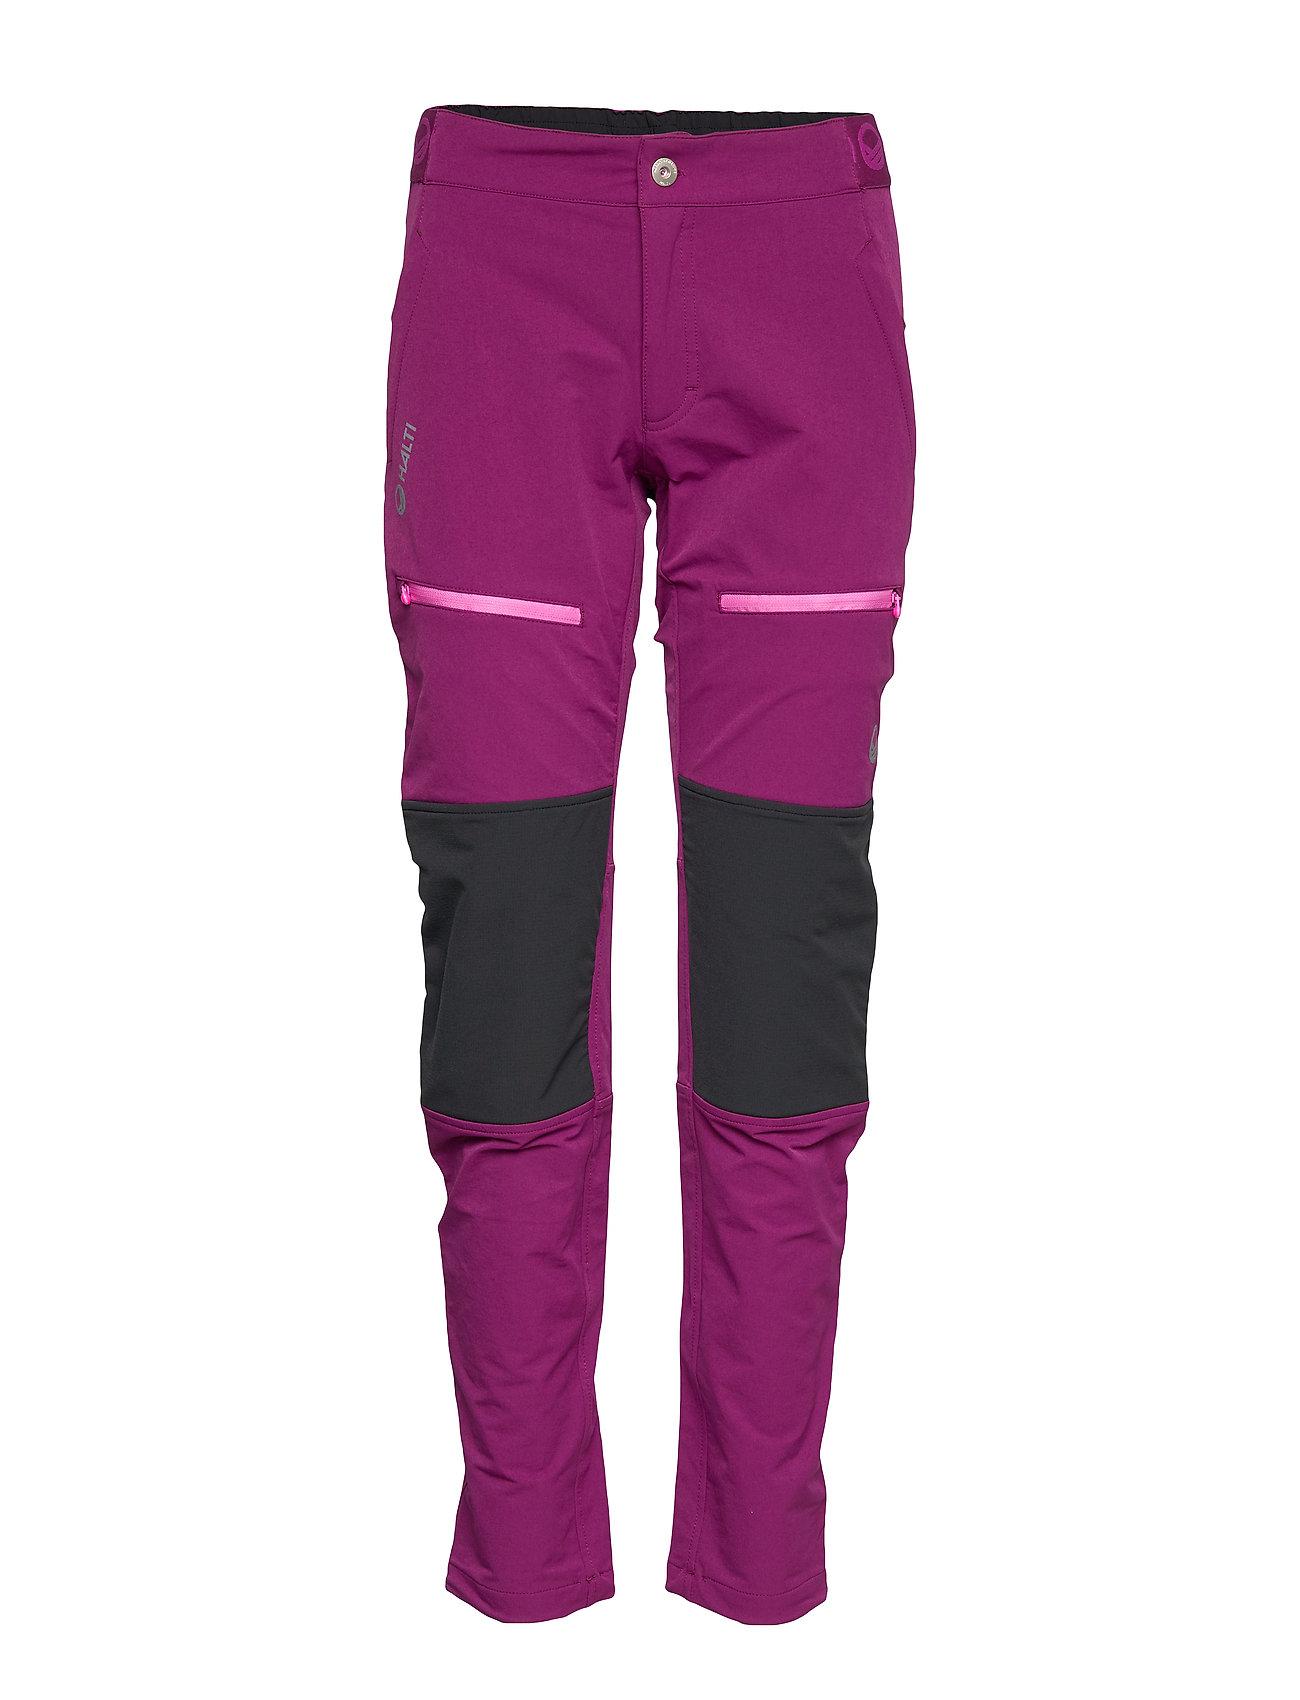 Halti Pallas Women's Warm X-Stretch Pants - MAGENTA PURPLE